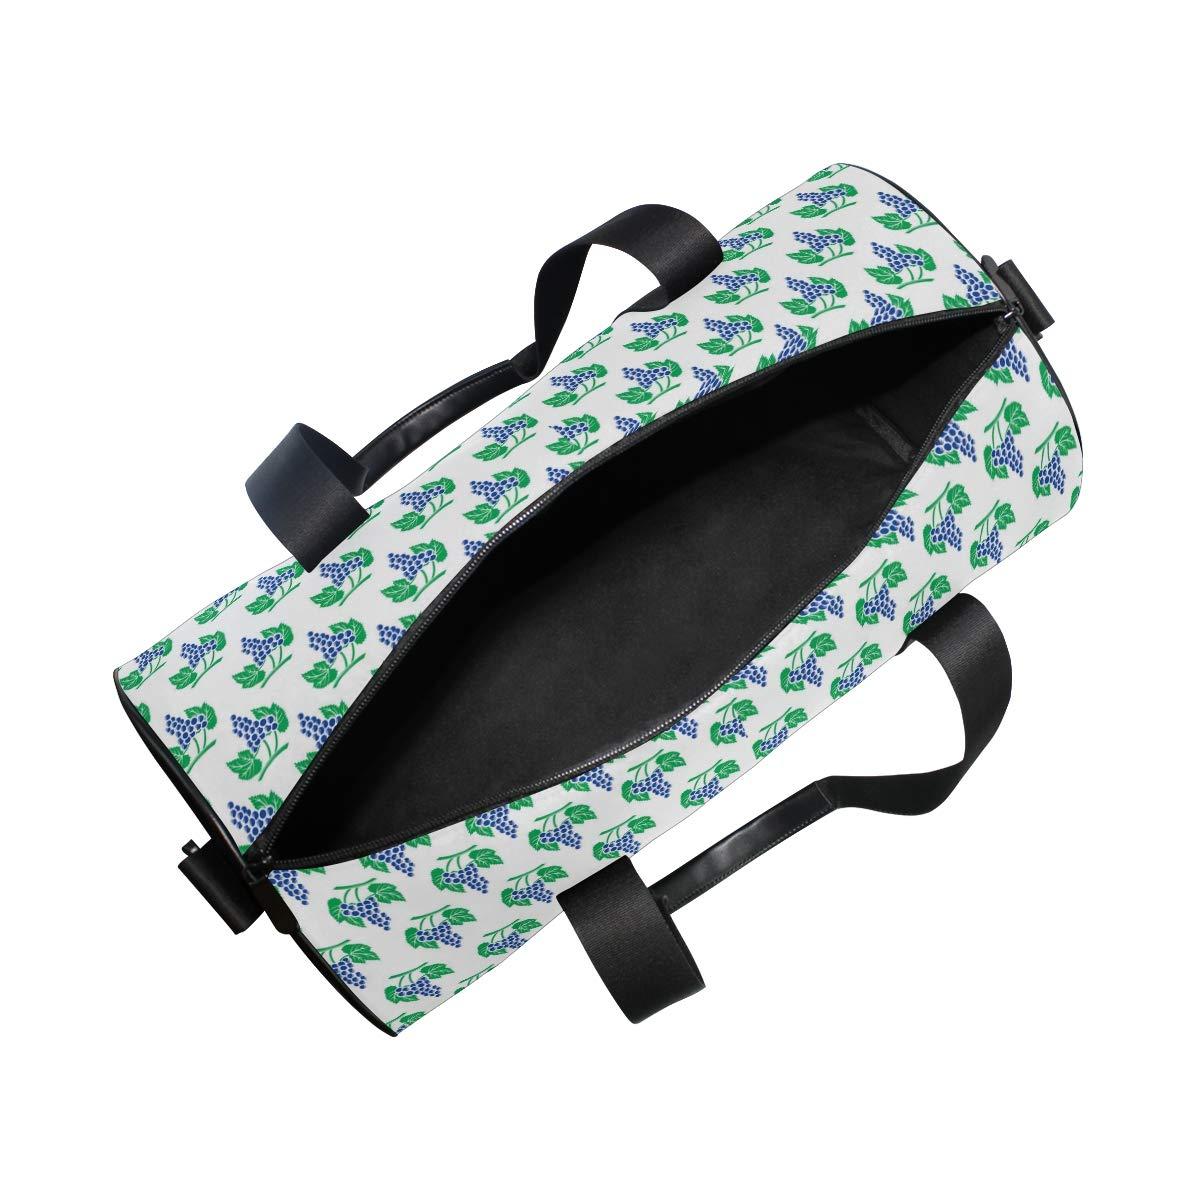 Waterproof Non-Slip Wearable Crossbody Bag fitness bag Shoulder Bag Grape Fruit Picture